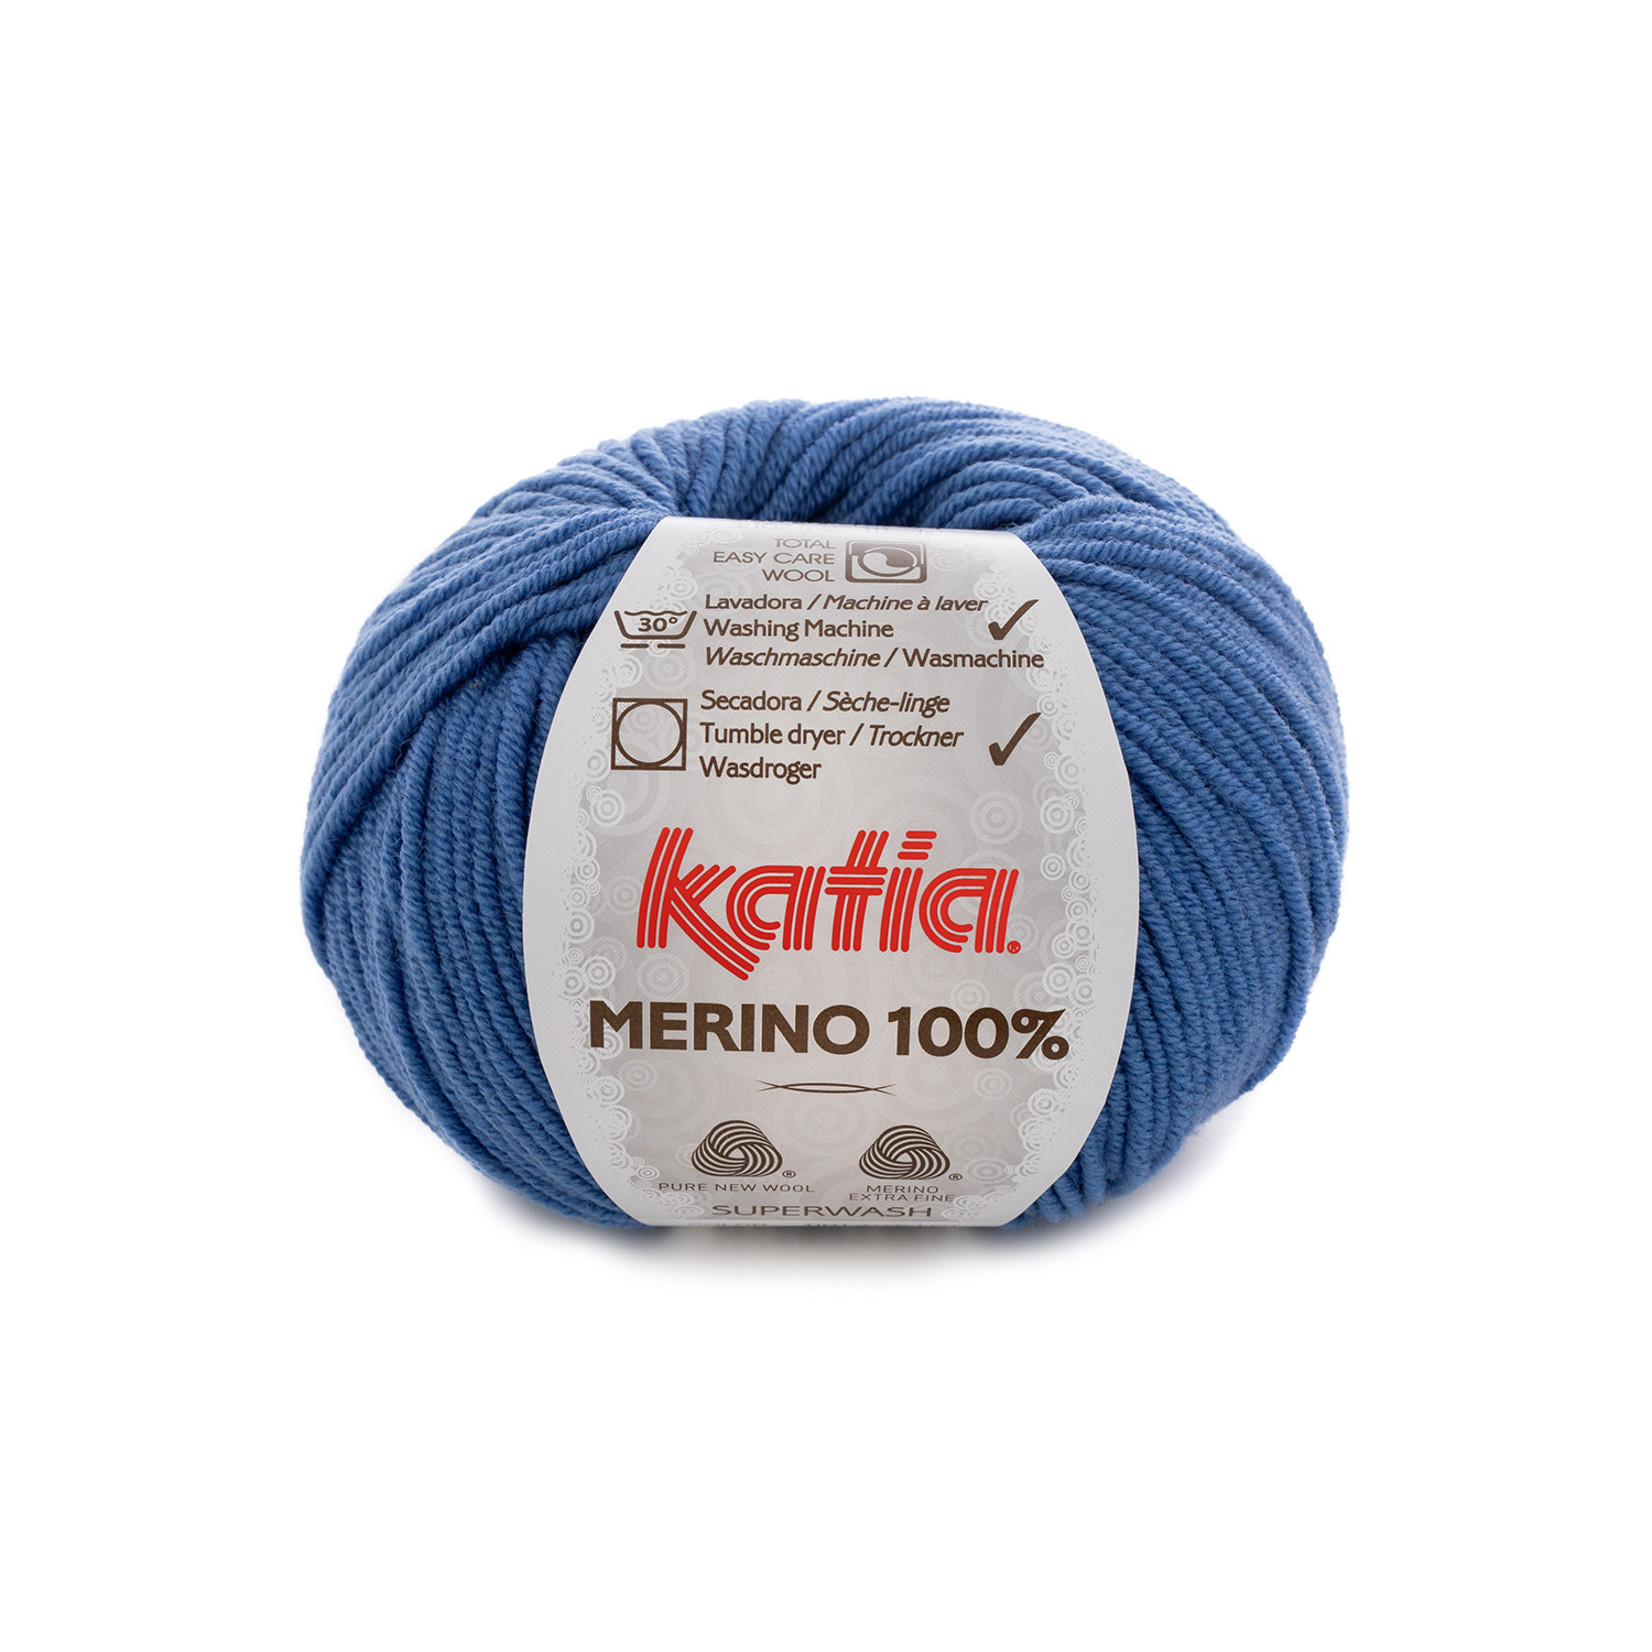 Katia Katia Merino 100% - 78 - Denim - 50 gr. = 102 m.